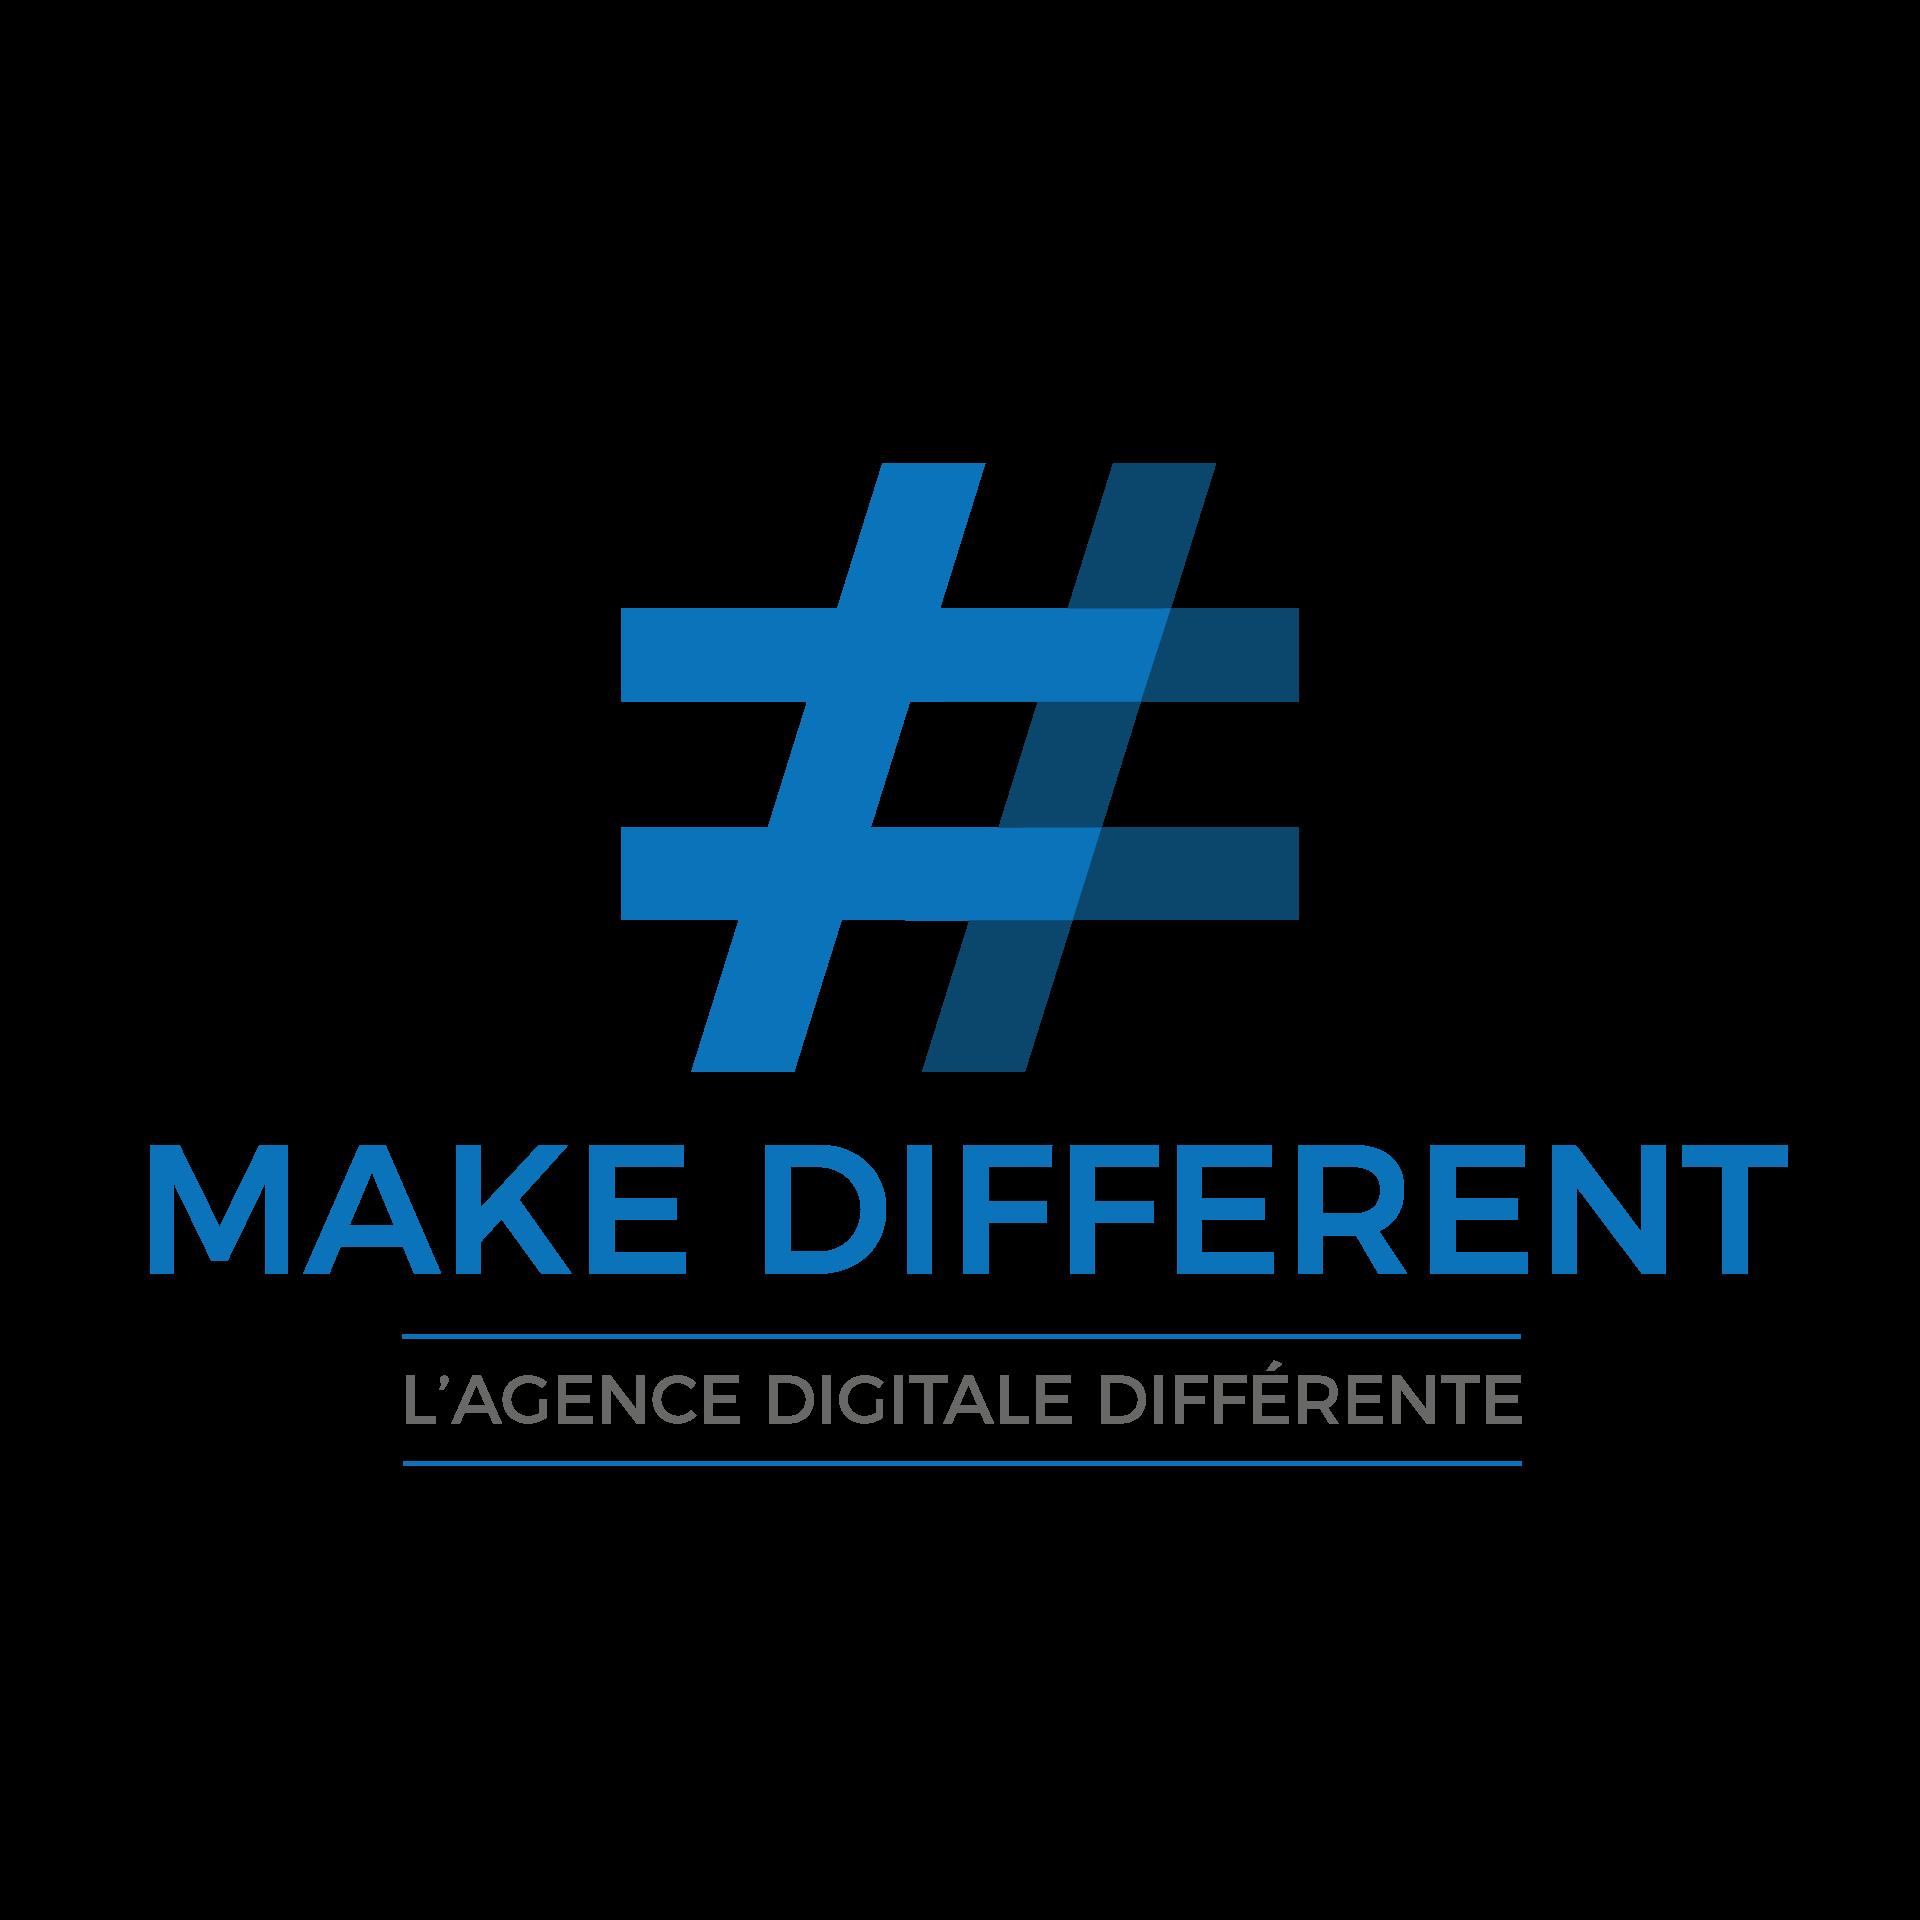 MAKE DIFFERENT logo